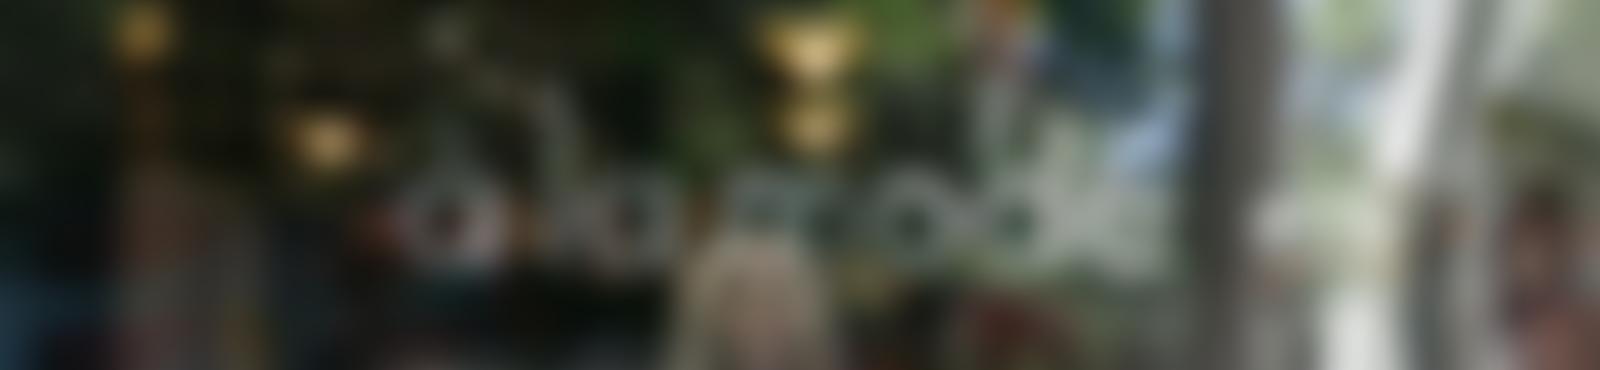 Blurred abb79772 d9ed 4b2c 8f68 9cefac2804e7